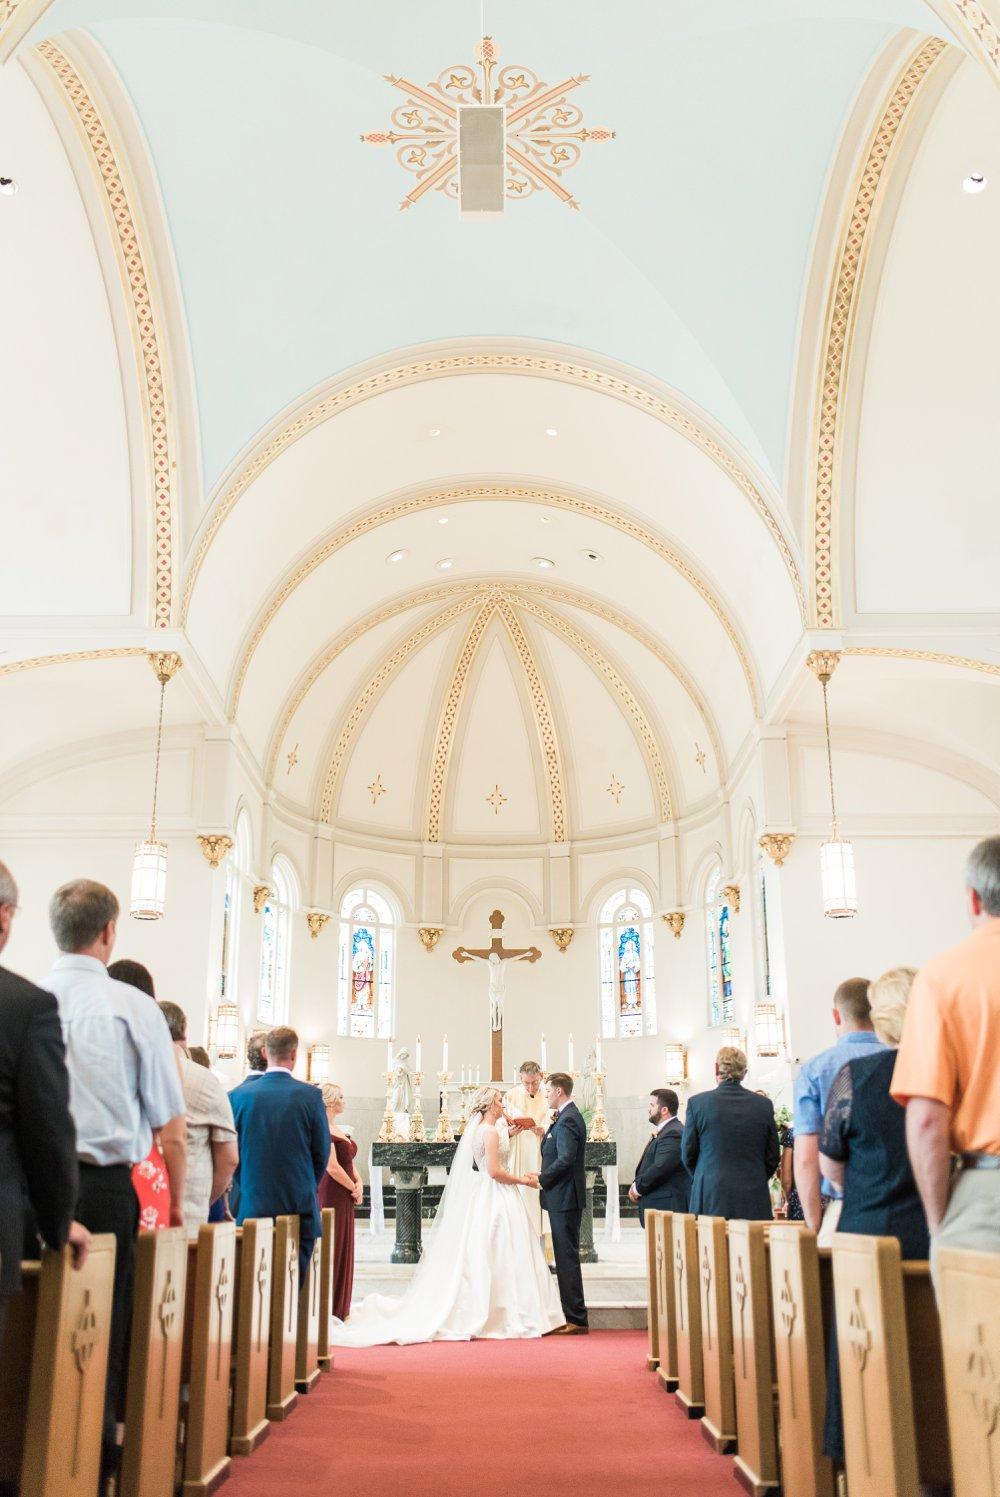 shawnee-lodge-state-park-wedding-portsmouth-ohio_0050.jpg